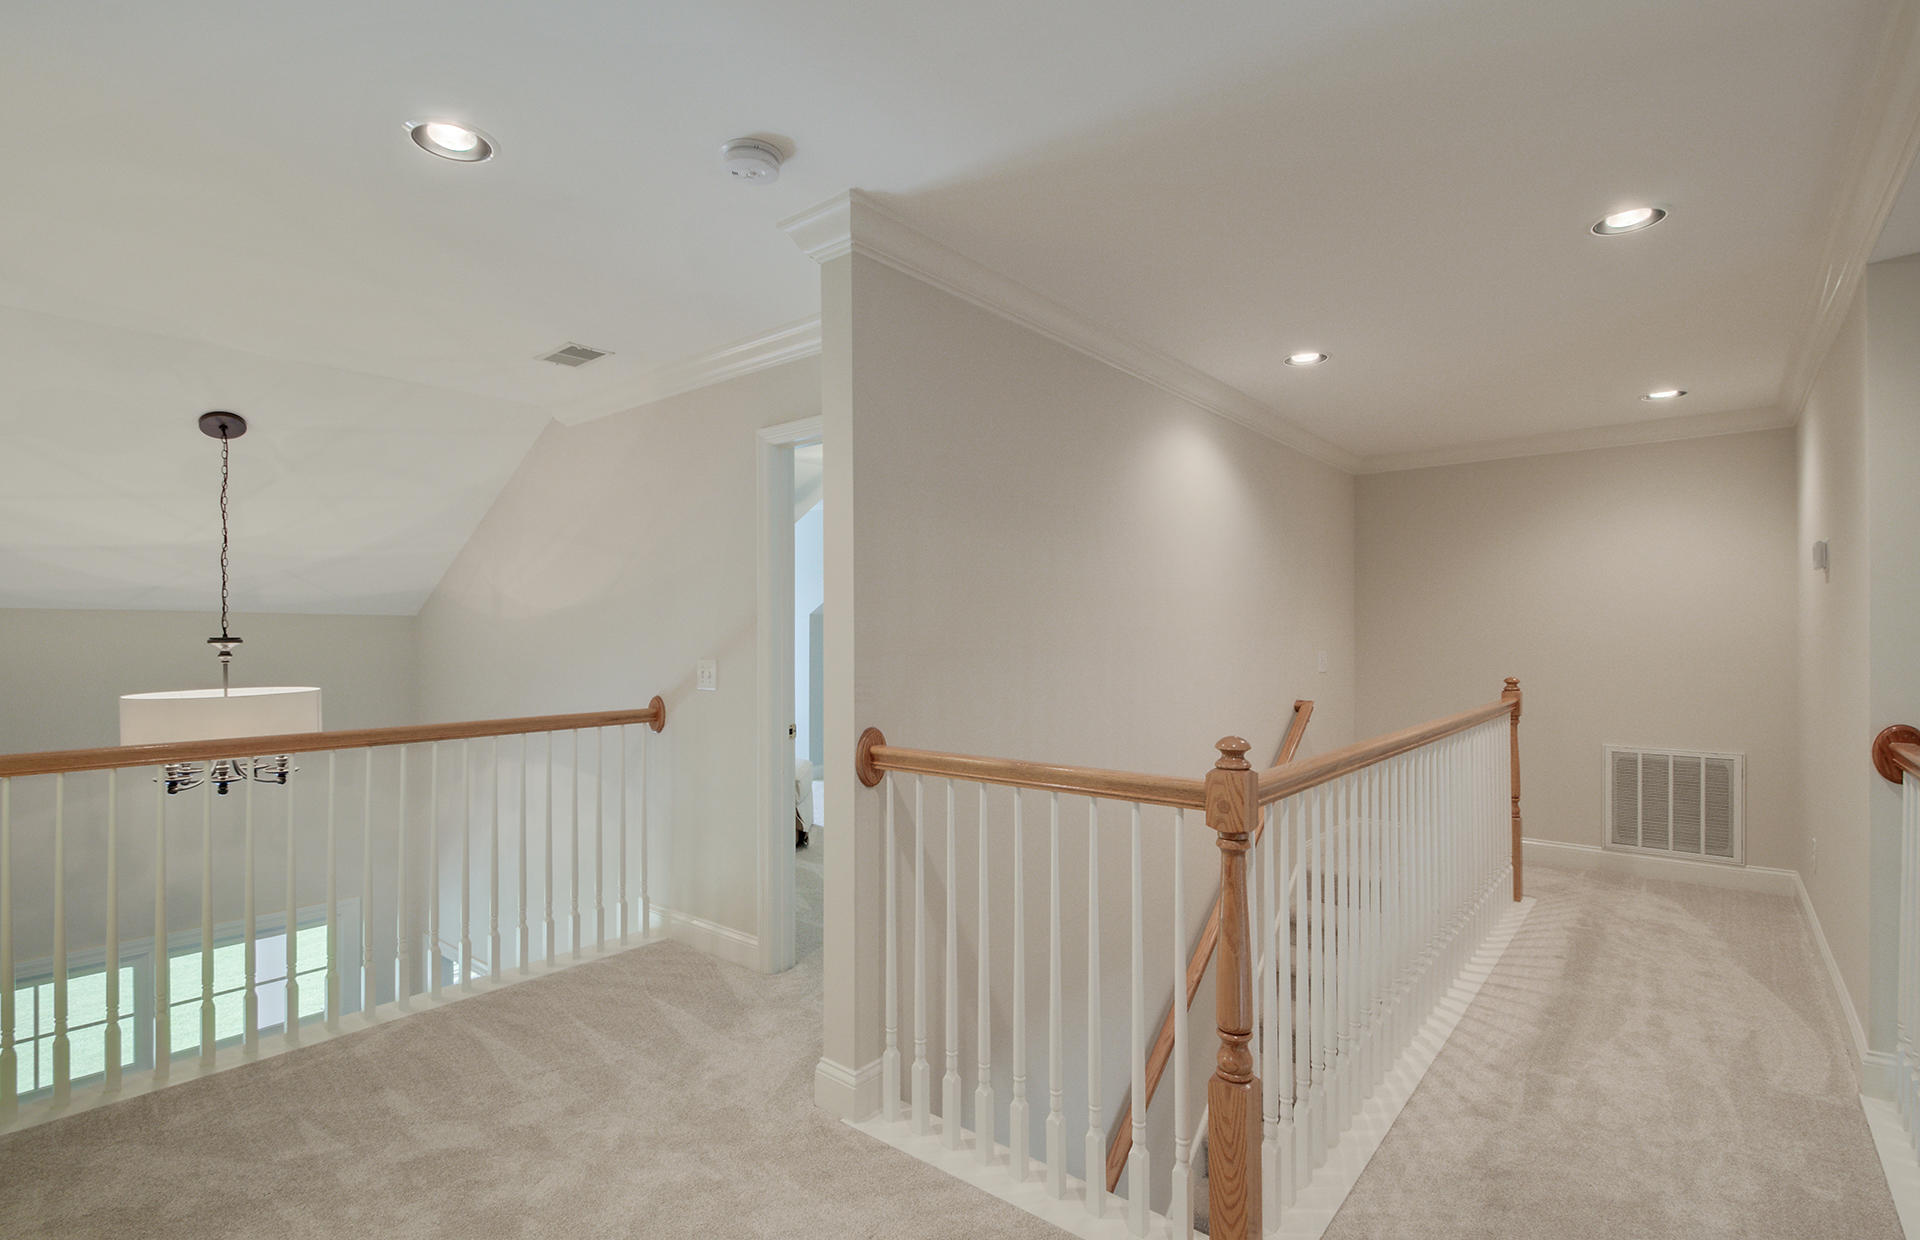 Dunes West Homes For Sale - 2453 Darts Cove, Mount Pleasant, SC - 27